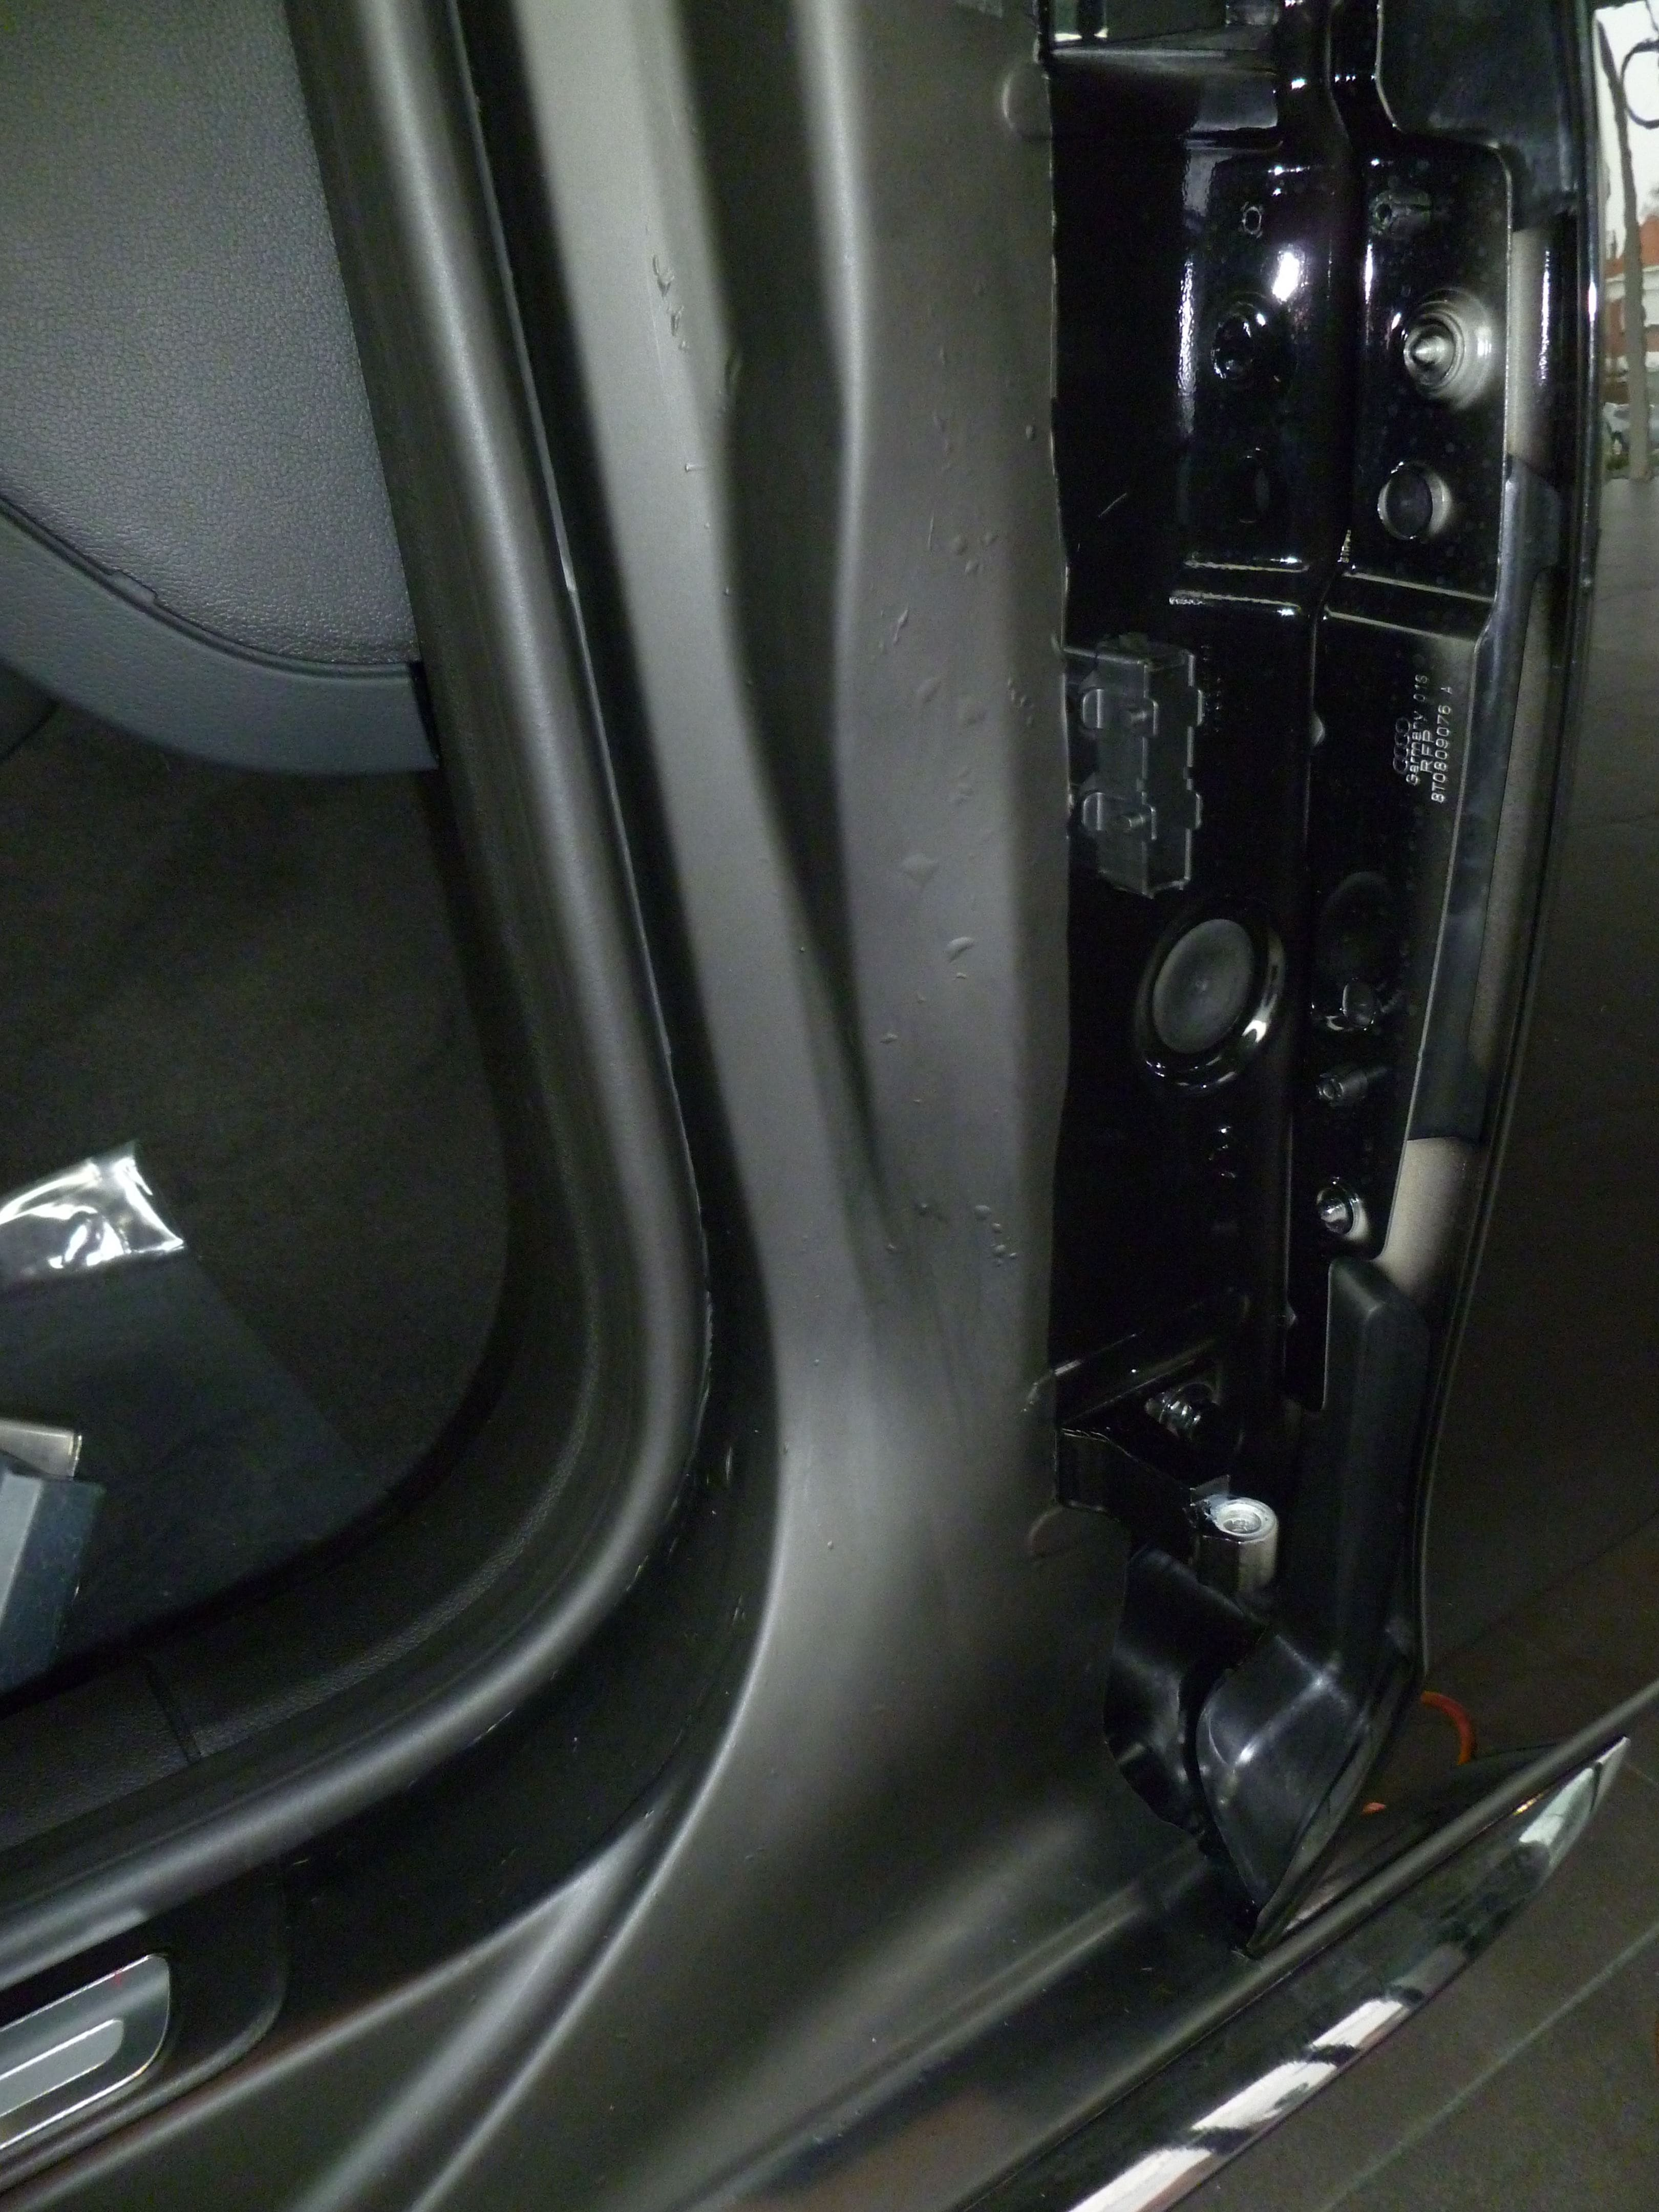 Audi A5 Coupe met Mat Zwarte Wrap, Carwrapping door Wrapmyride.nu Foto-nr:4622, ©2021